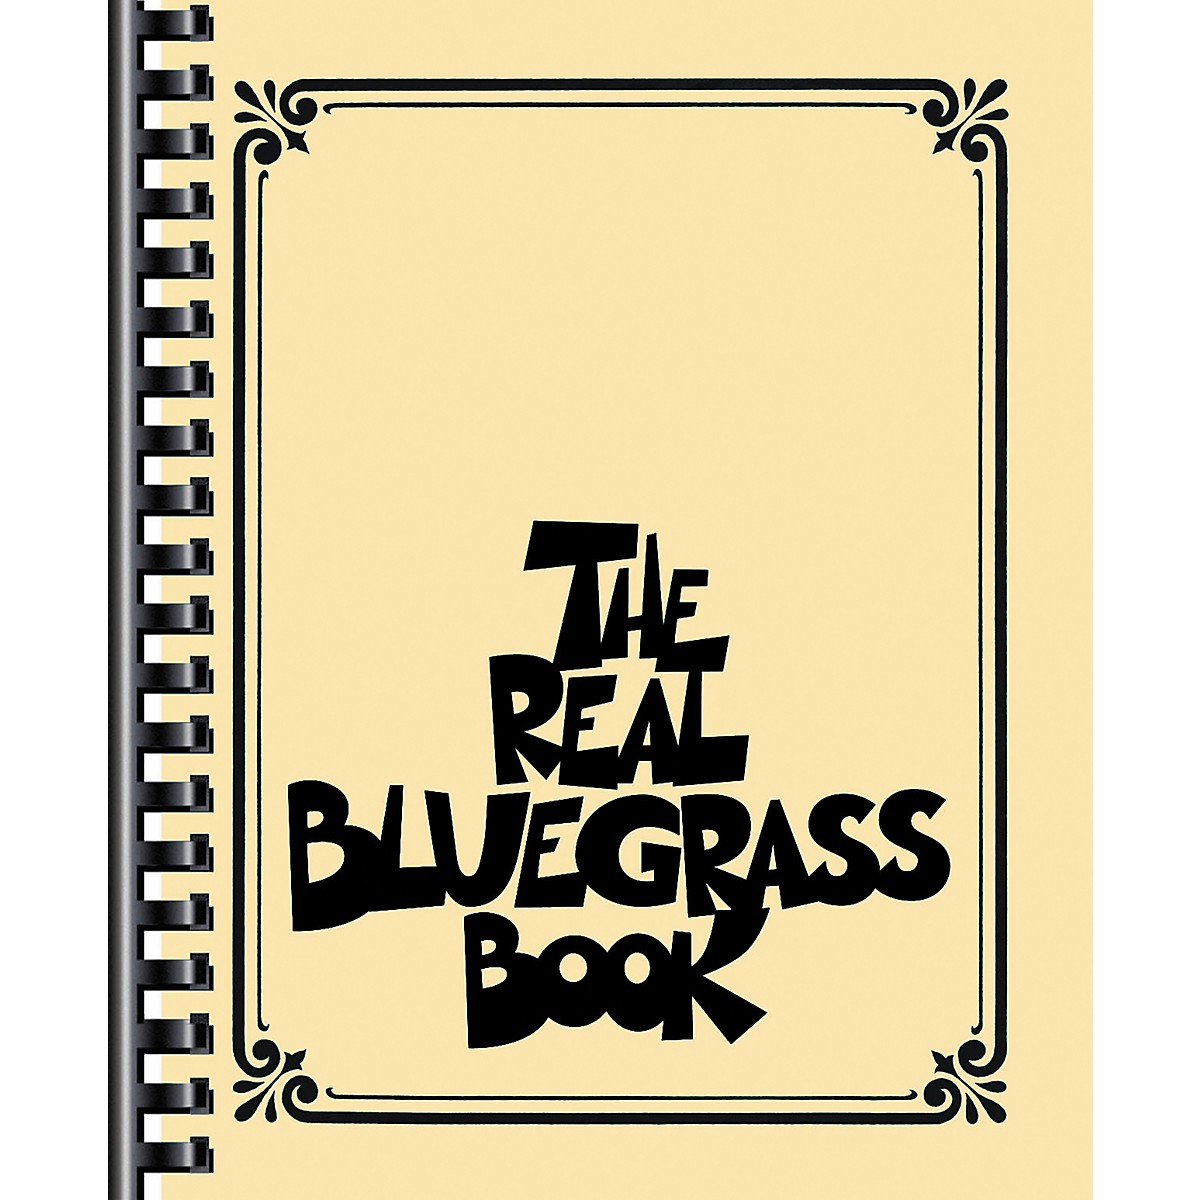 Hal Leonard The Real Bluegrass Book - Fake Book